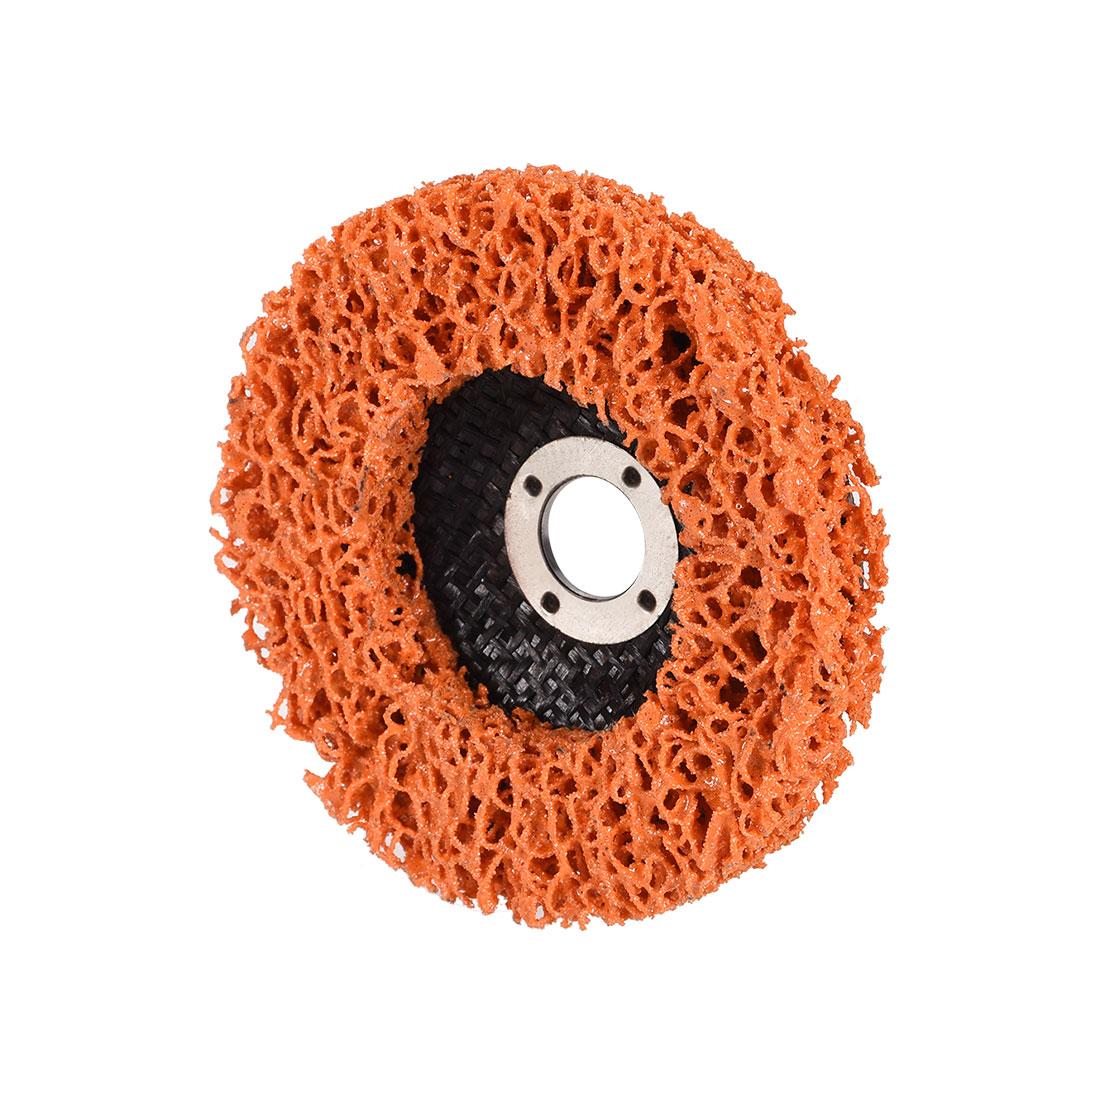 4 Inch Nylon Polishing Wheel Buffing Pad Felt Disc Orange